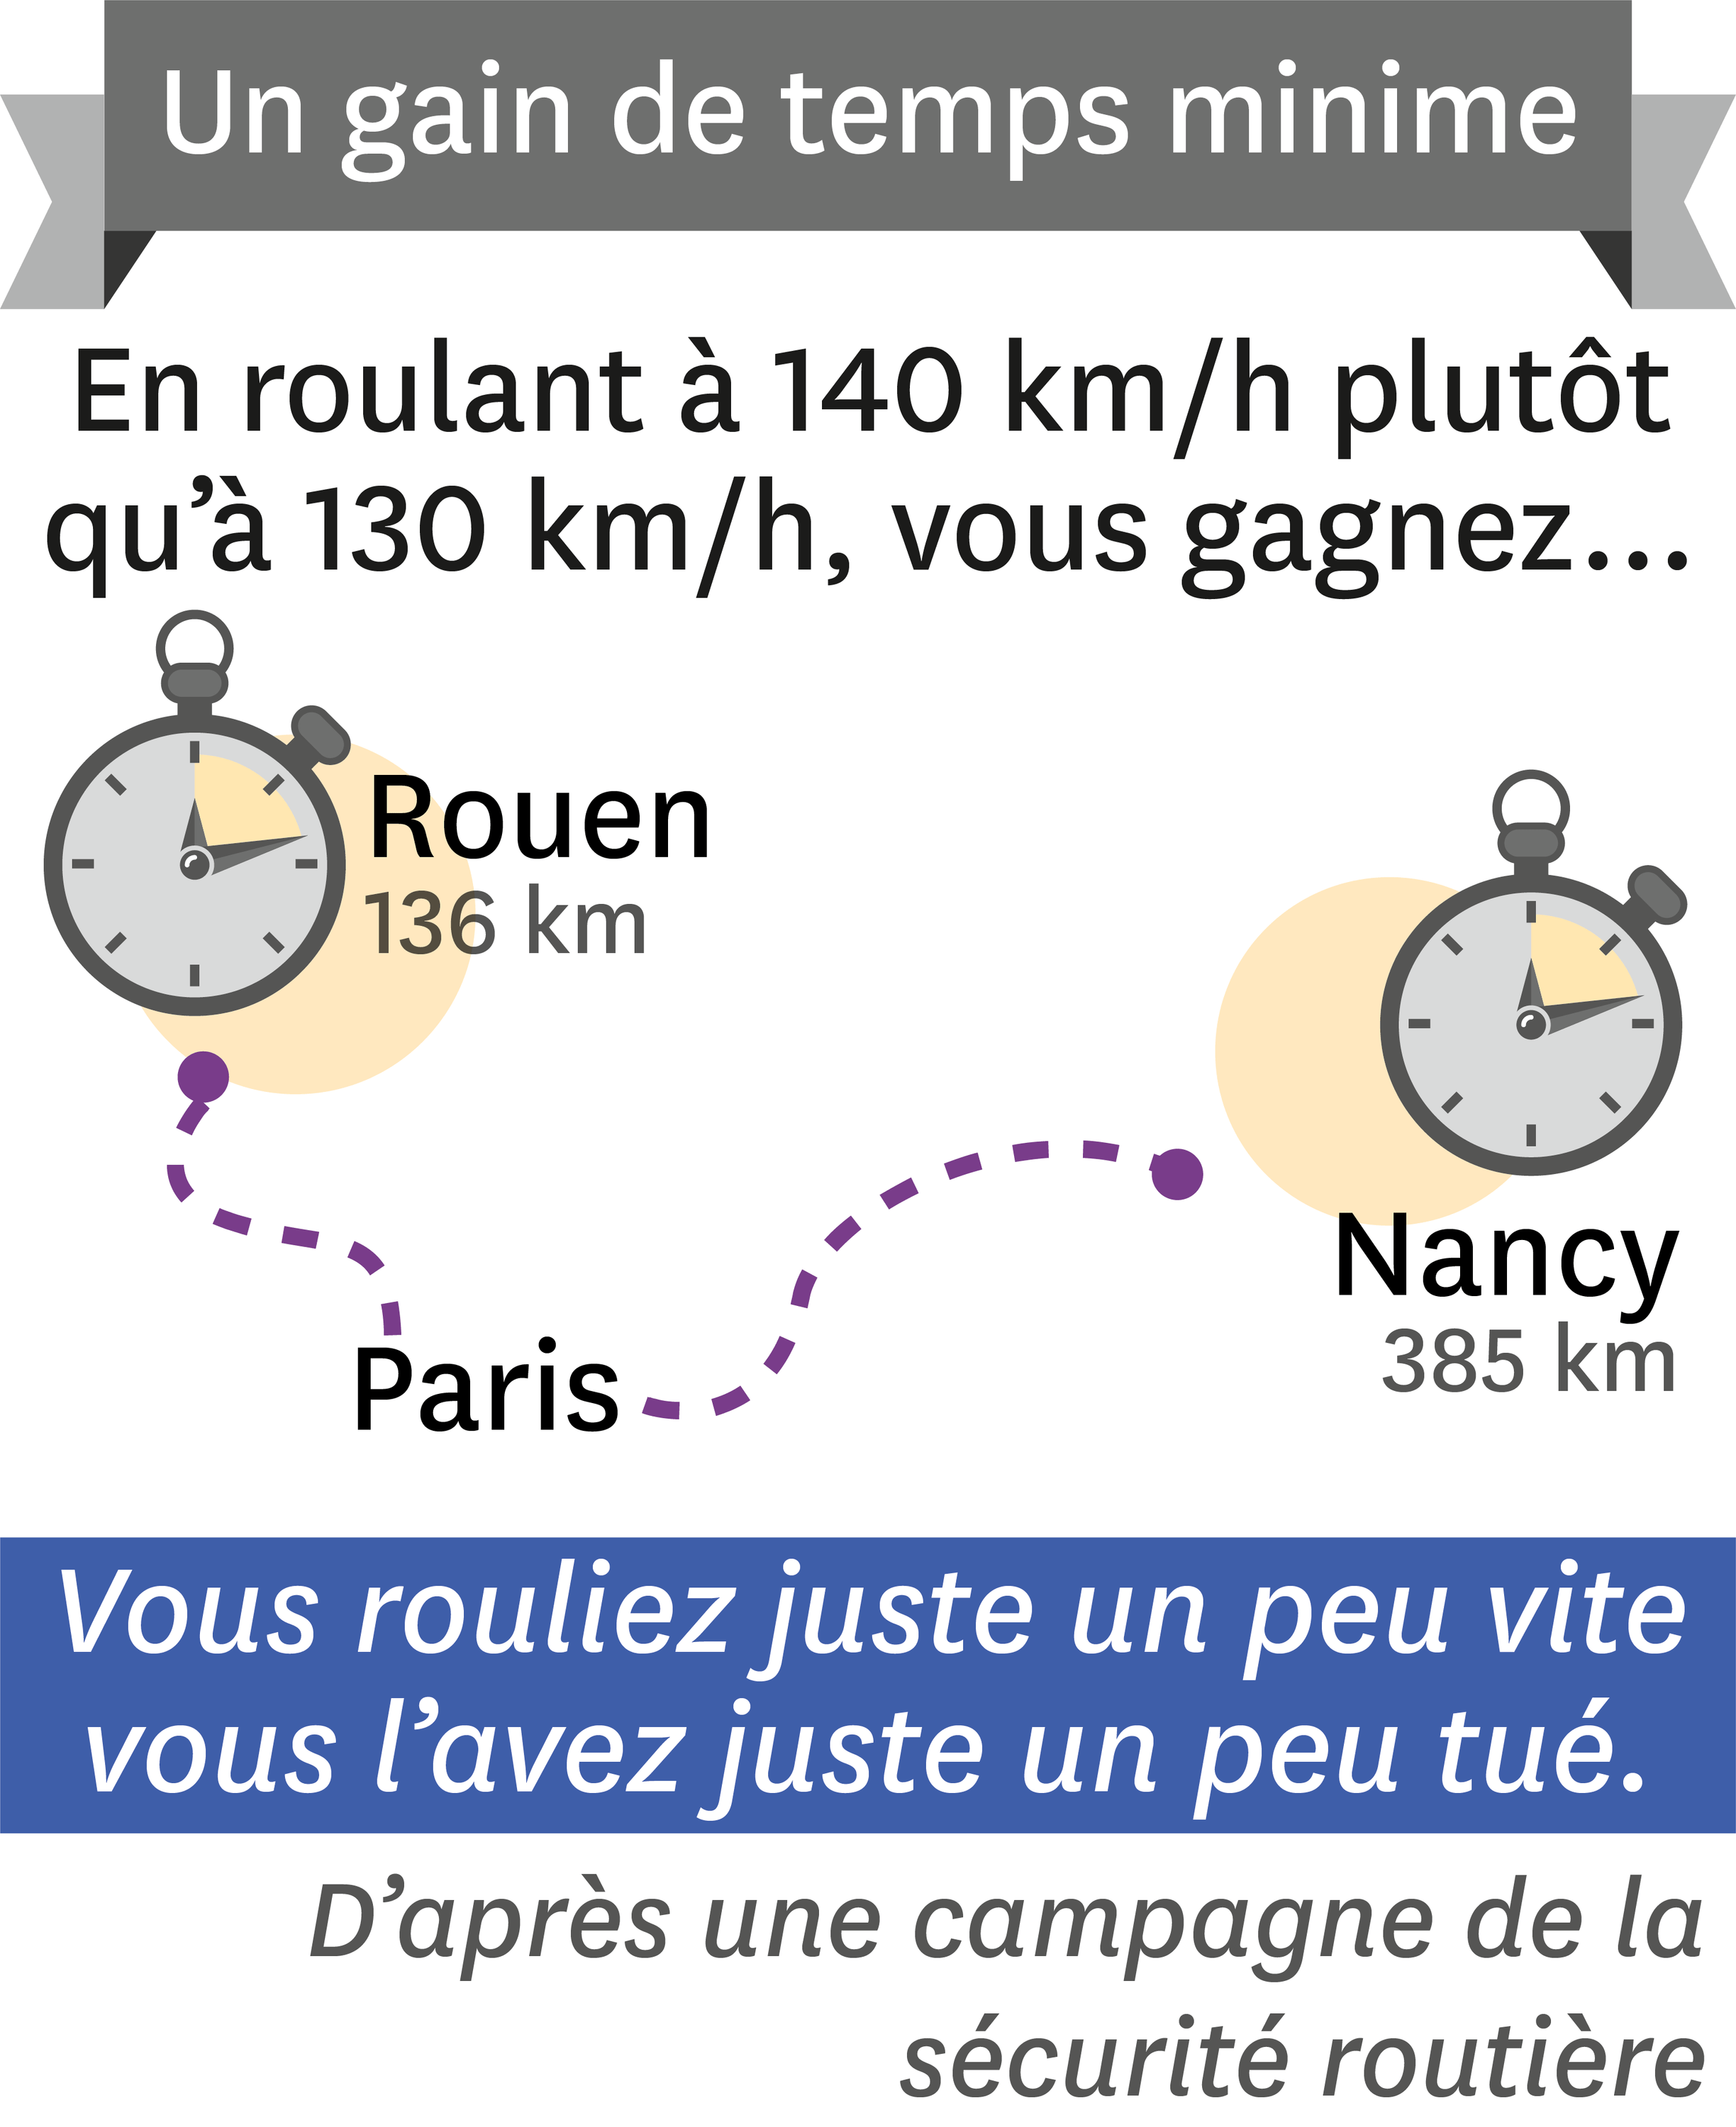 <stamp theme='pc-green1'>Doc. 1</stamp> Rouen - Paris - Nancy.